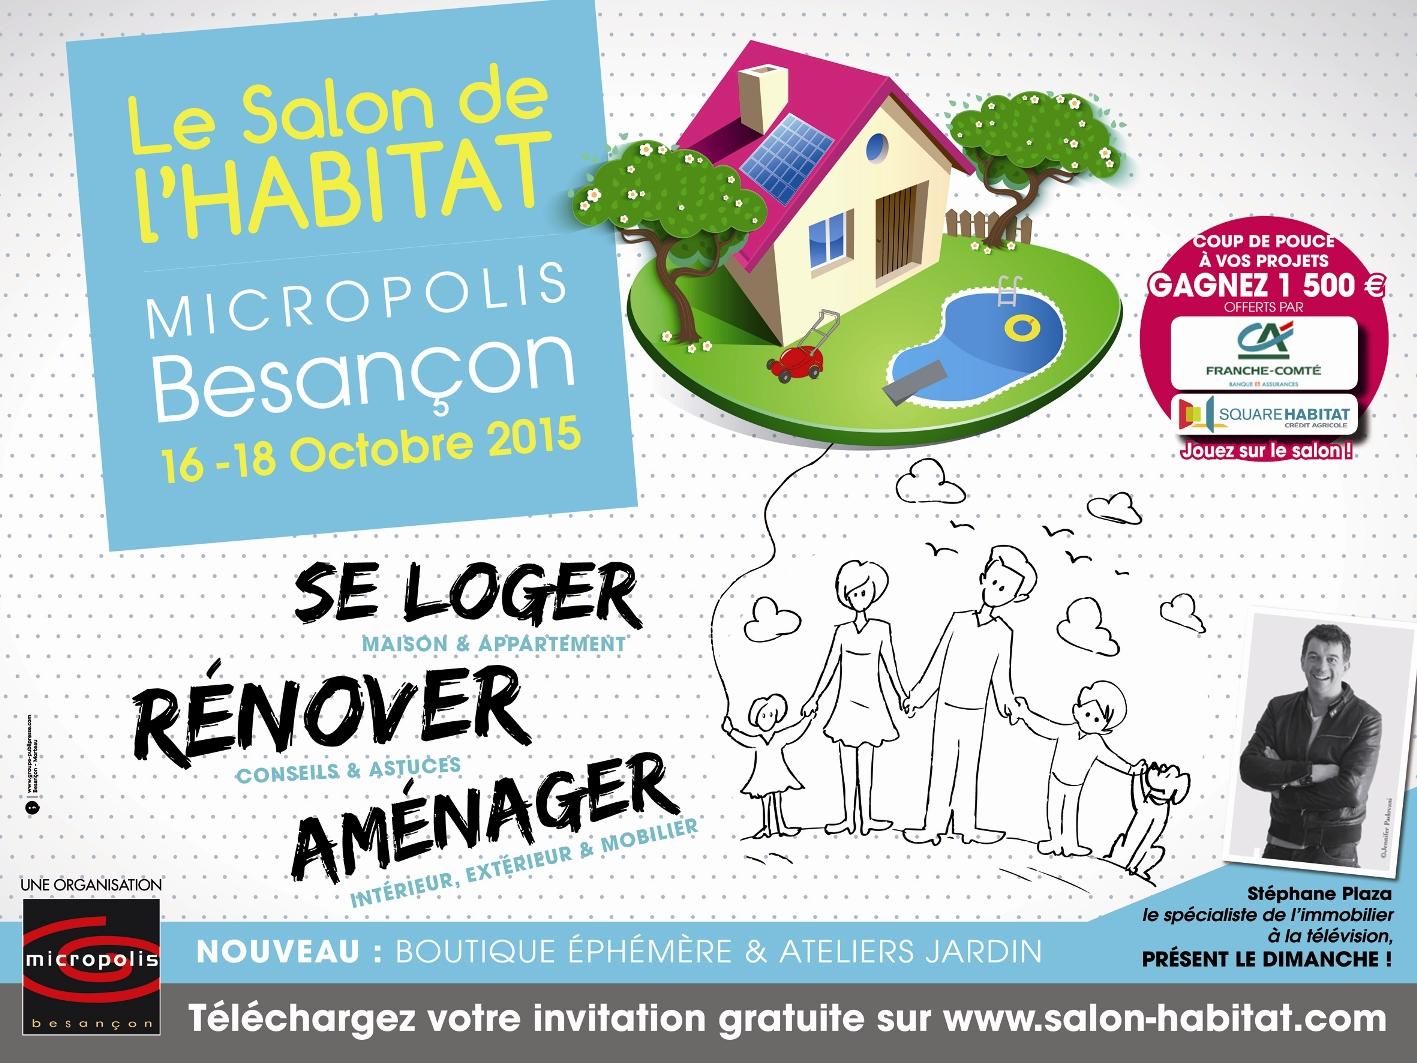 Maitrise d 39 oeuvre batiment salon habitat besan on 2014 - Salon habitat besancon ...